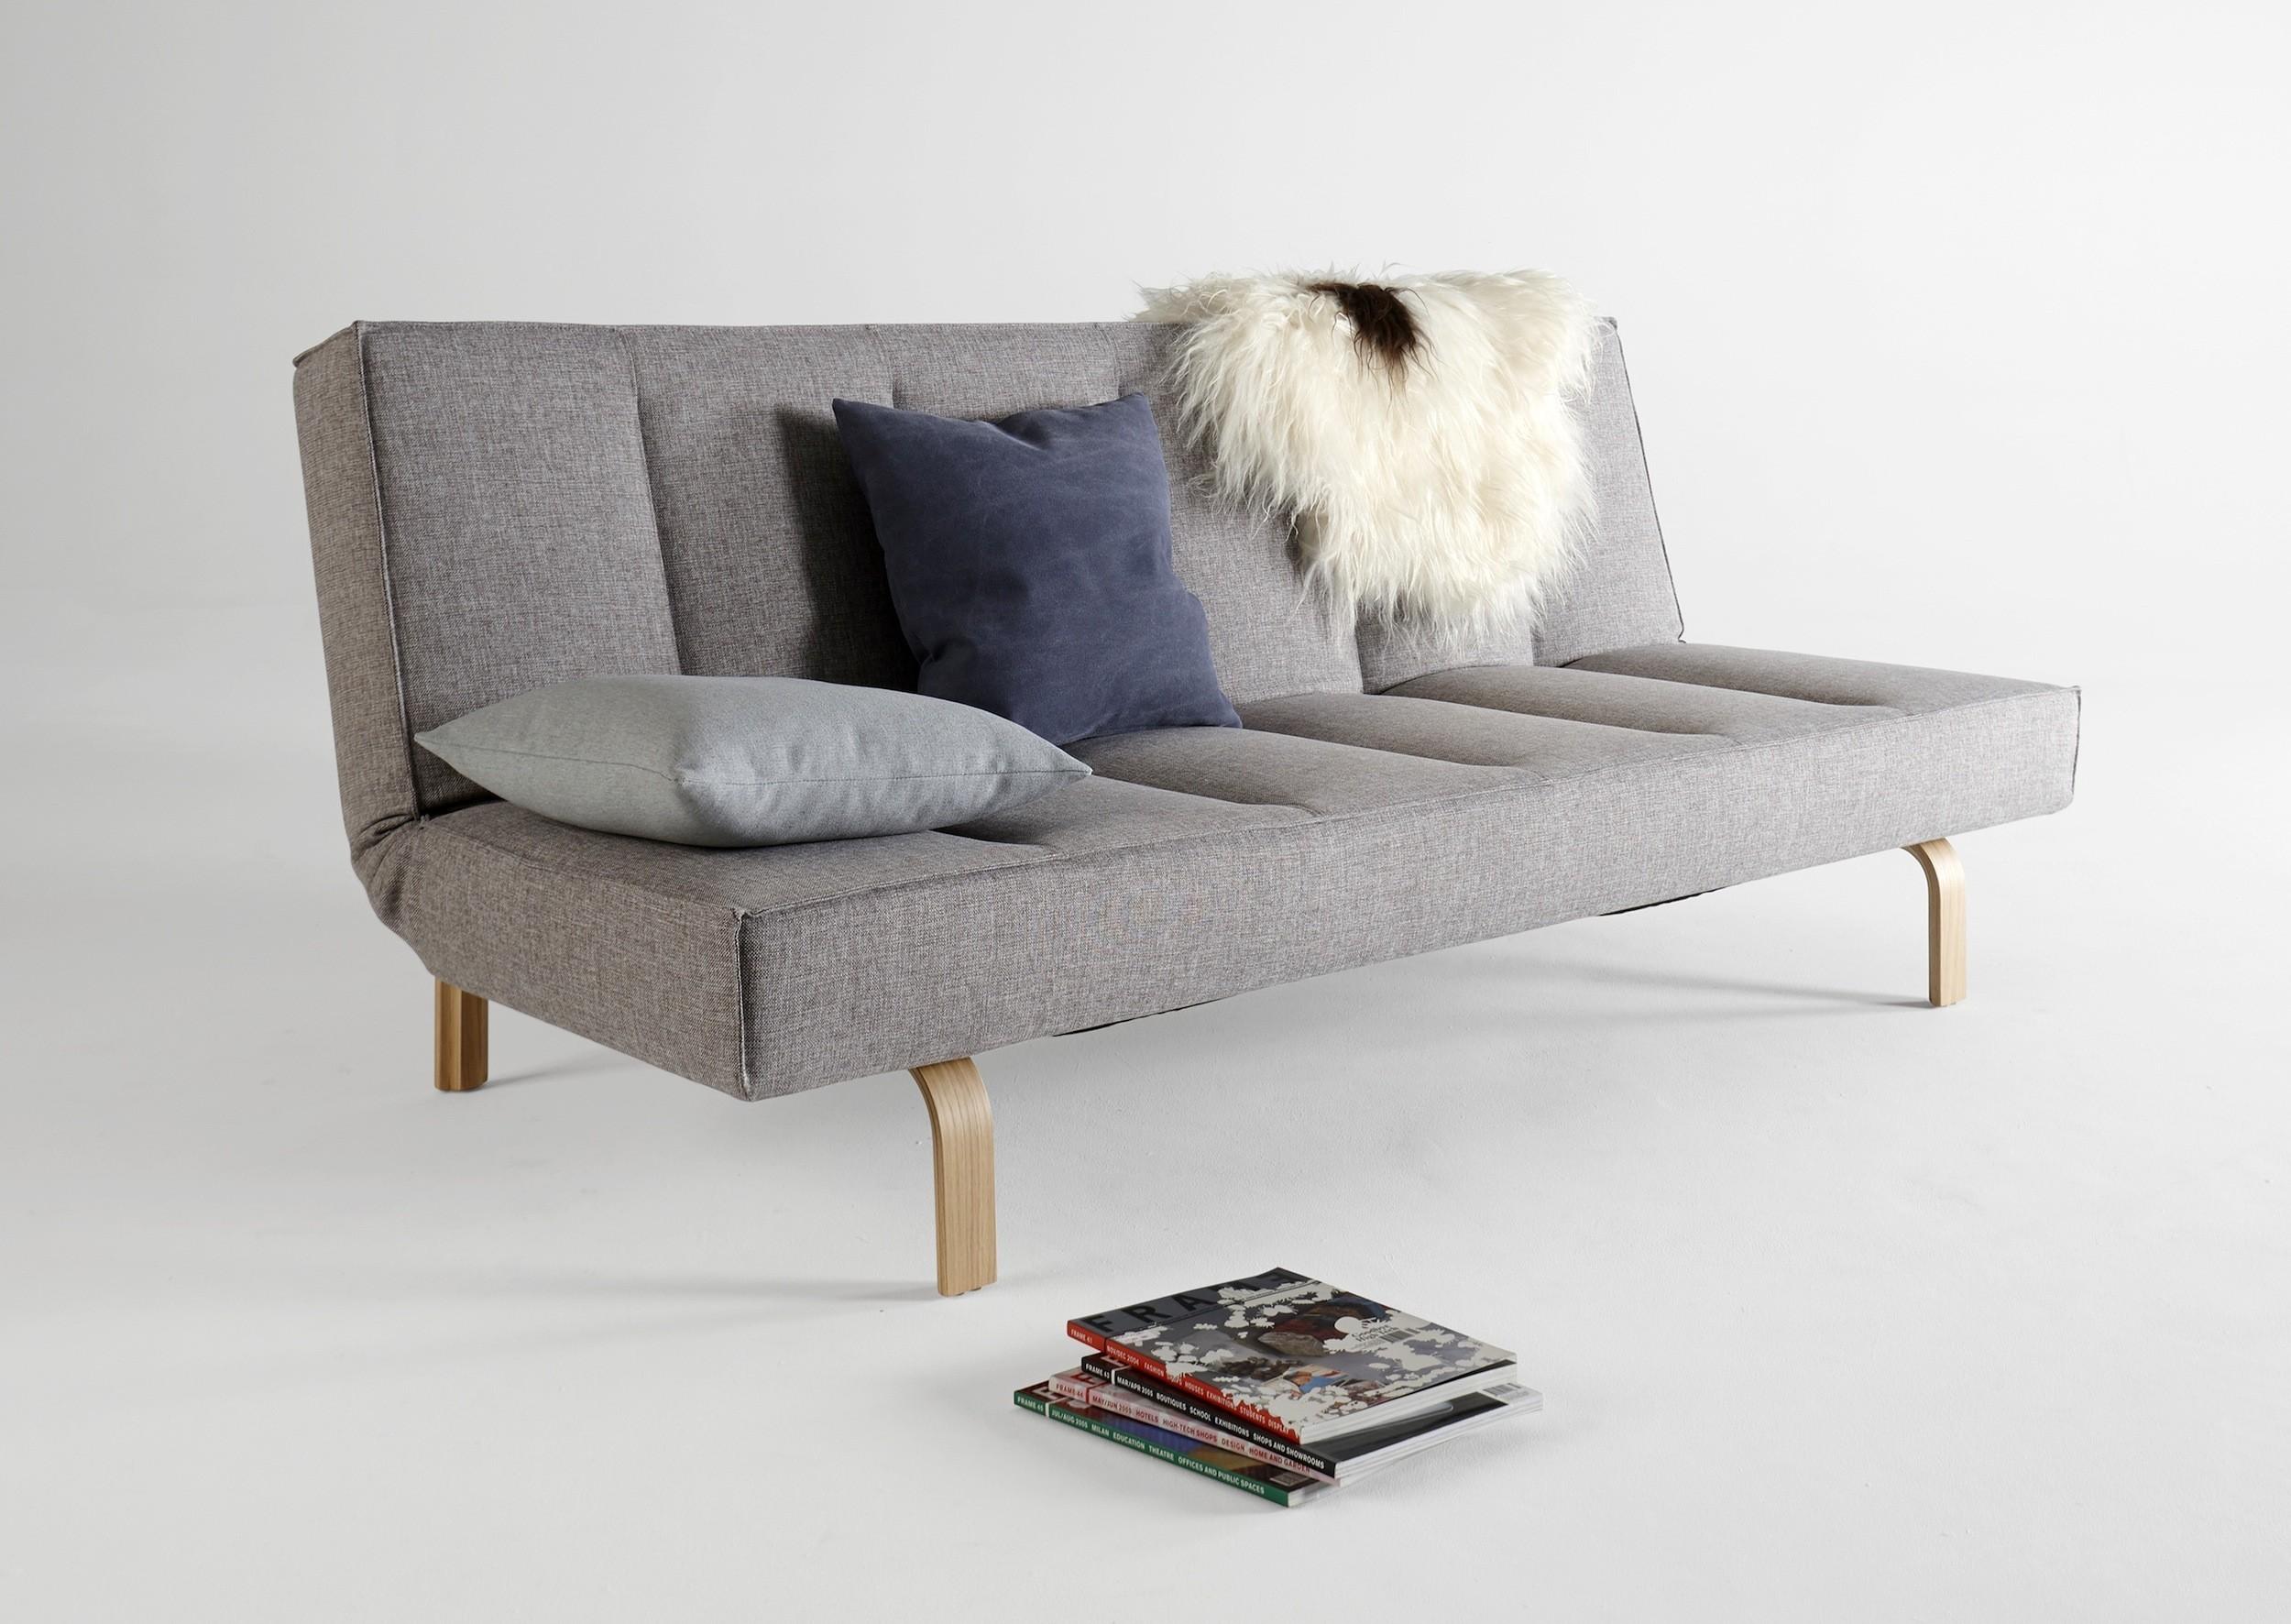 Odin King Single Sofa Bed Innovation Living